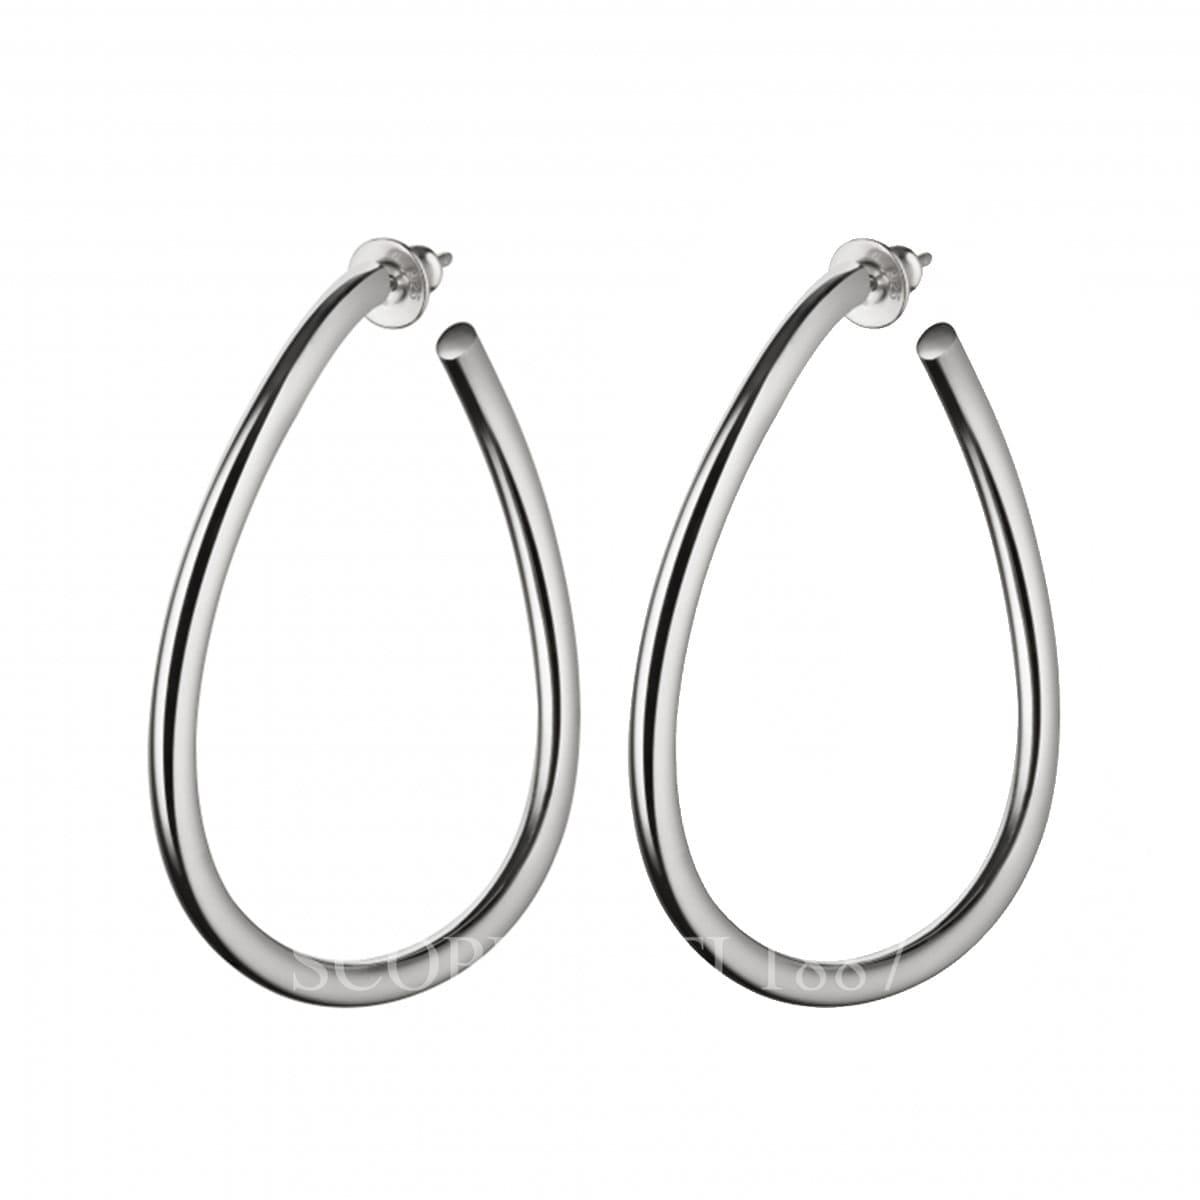 christofle sterling silver earrings